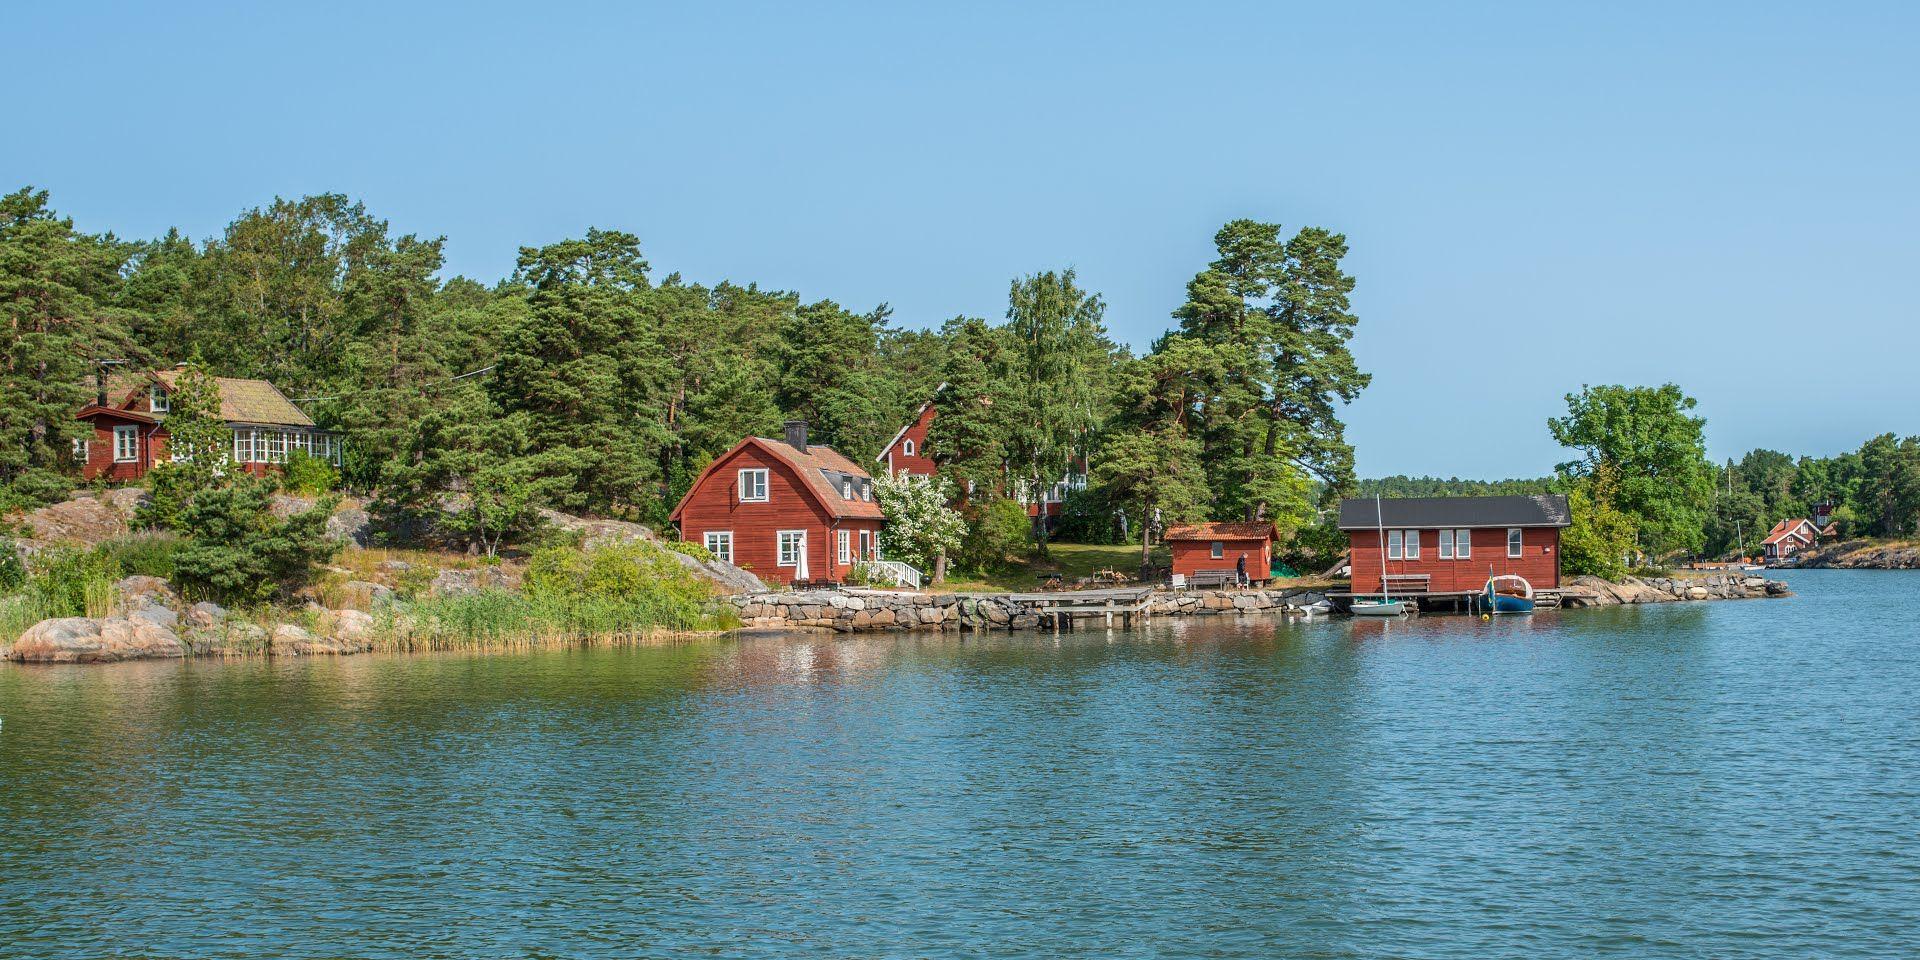 BengtENyman - Tyresö, Saltsjöbaden waterfronts Stockholm.